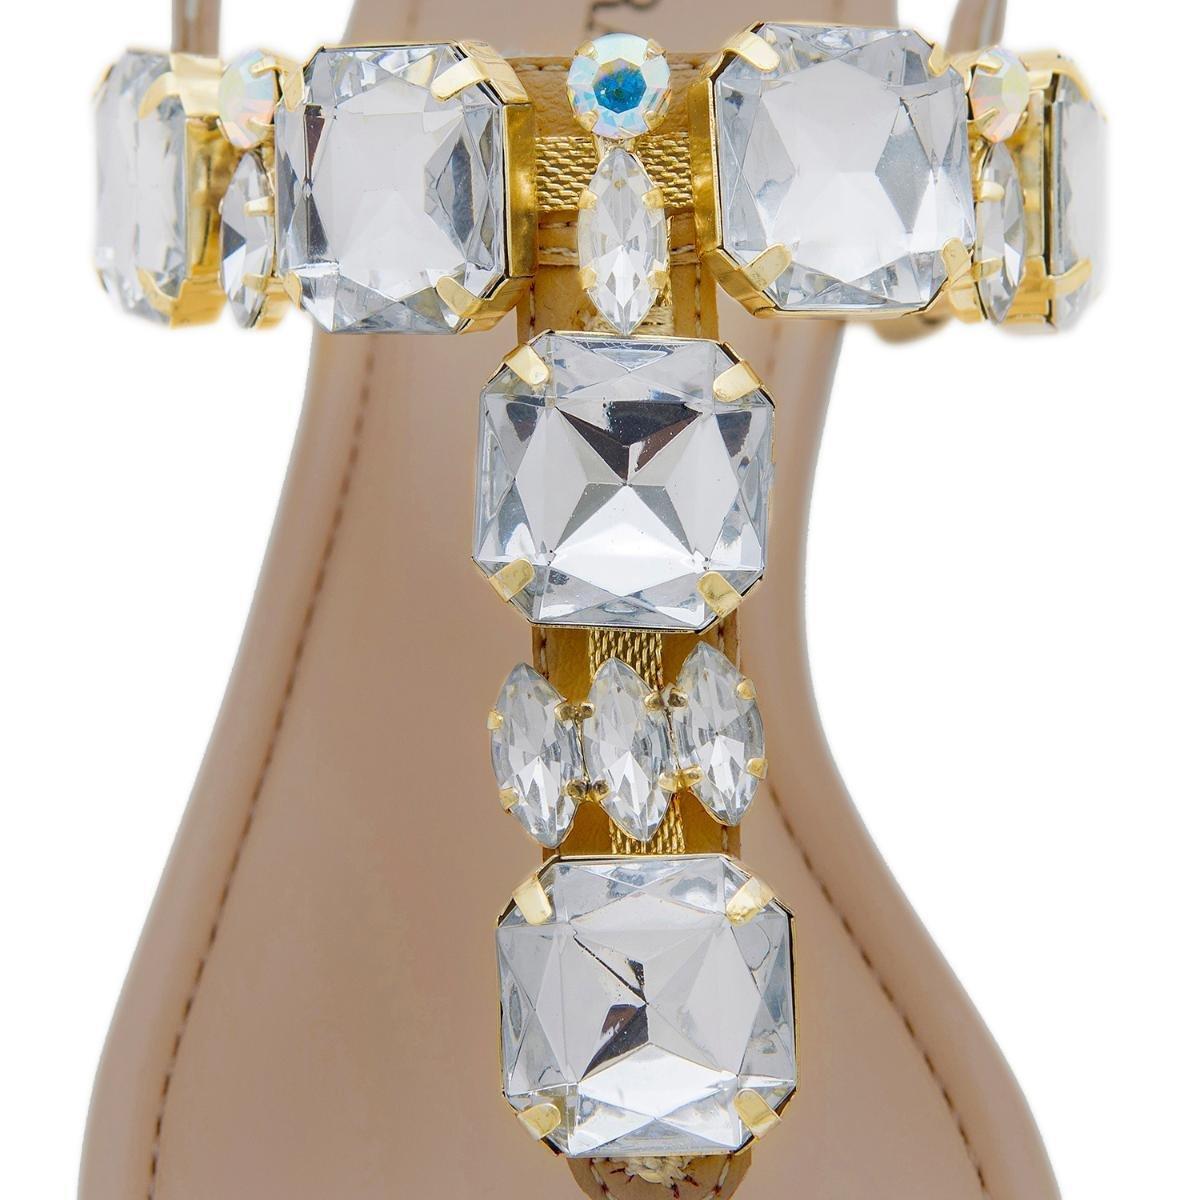 Rasteira Pedra Pura Pedraria Cristal Boreal Feminina - Marrom Claro